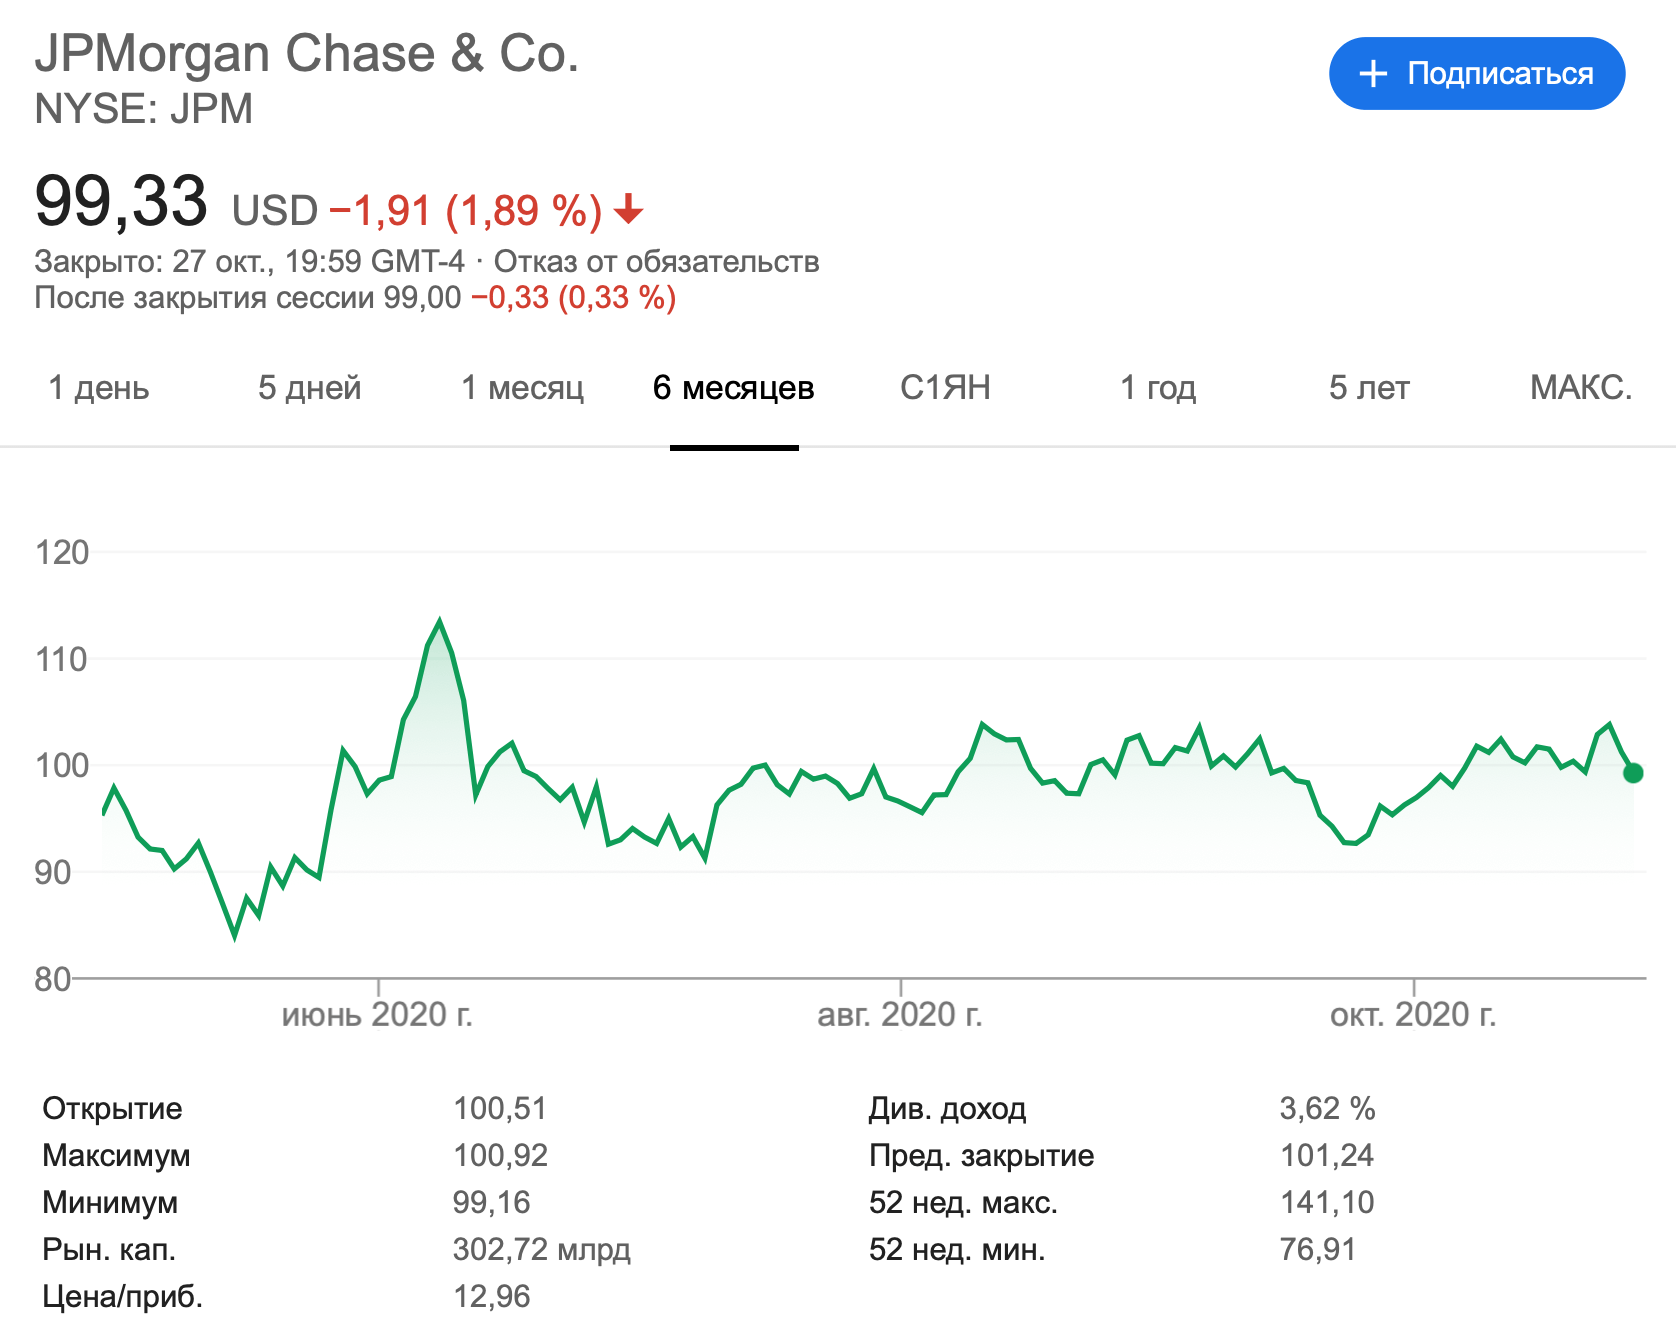 Показатели JPMorgan